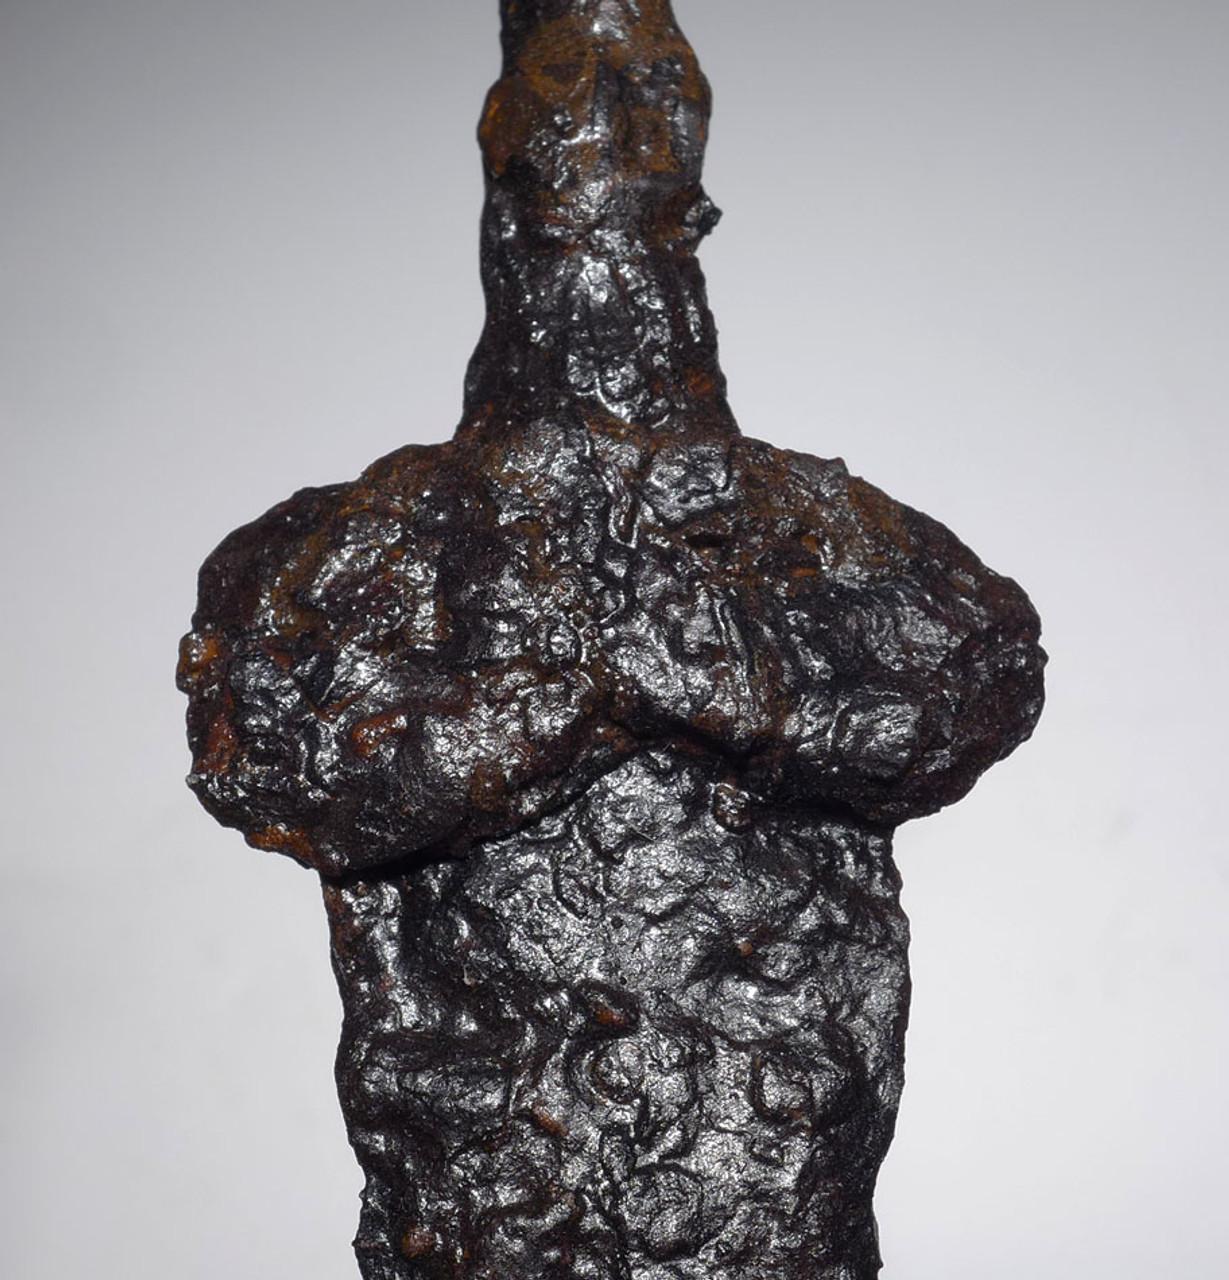 EXTREMELY RARE EUROPEAN SCYTHIAN ANCIENT IRON ASYMMETRIC BLADE AKINAKES DAGGER FROM THE BLACK SEA REGION *SC02